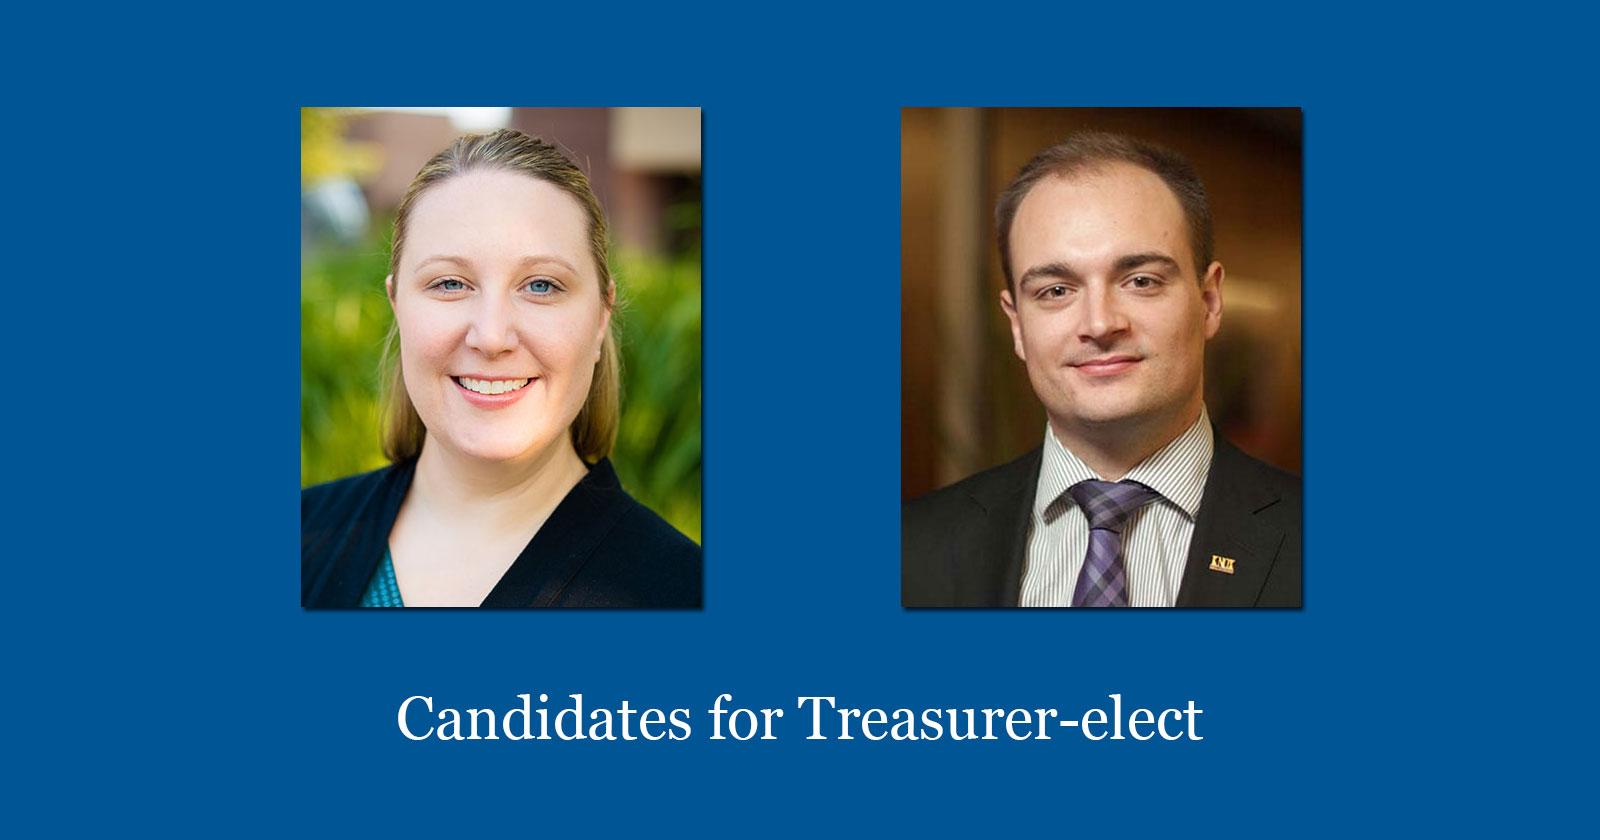 Candidates For Treasurer-elect 2016